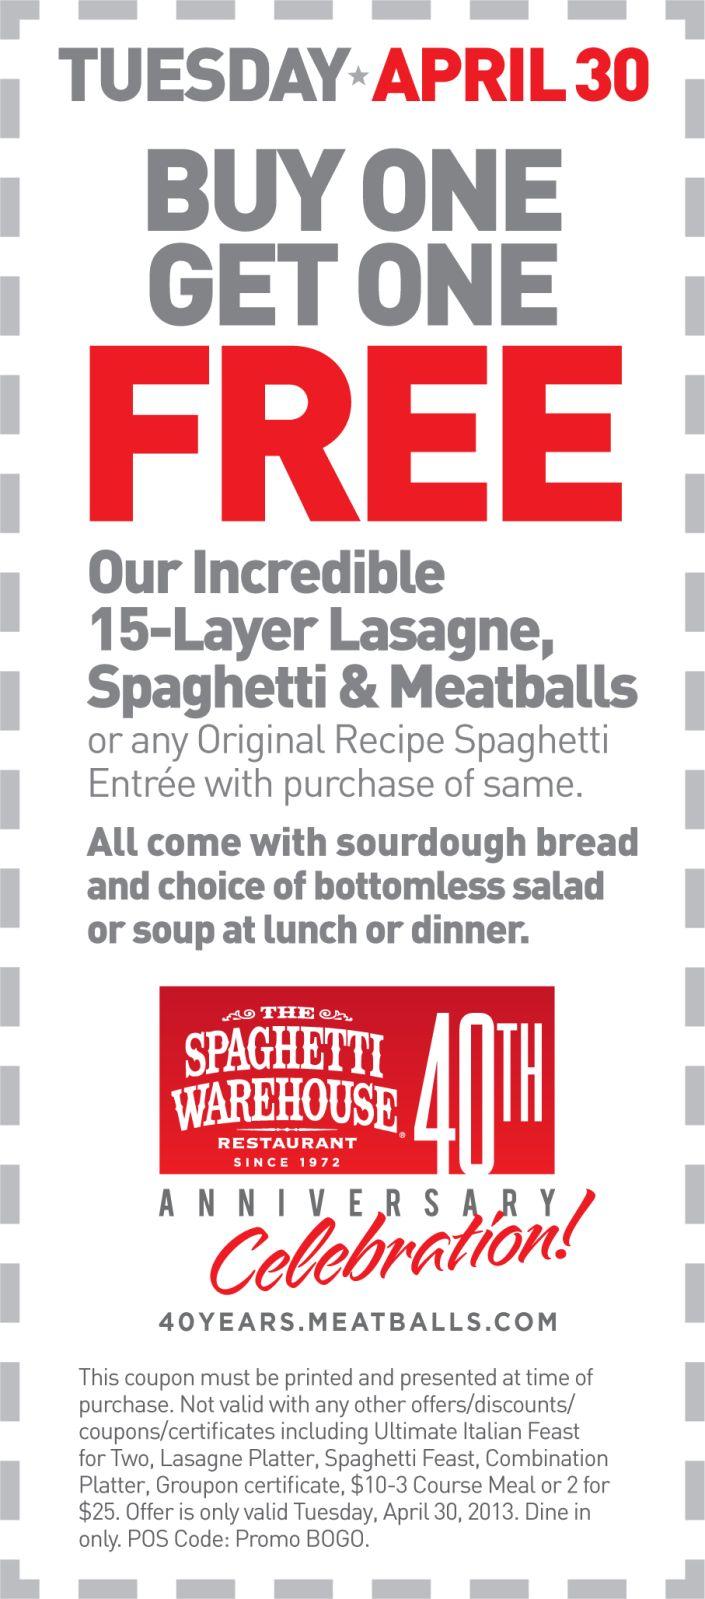 Kirklands coupons december 2013 - Spaghetti Warehouse Coupon Spaghetti Warehouse Promo Code From The Coupons App Second Lasagna Or Spaghetti Meal Free Tuesday At Spaghetti Warehouse